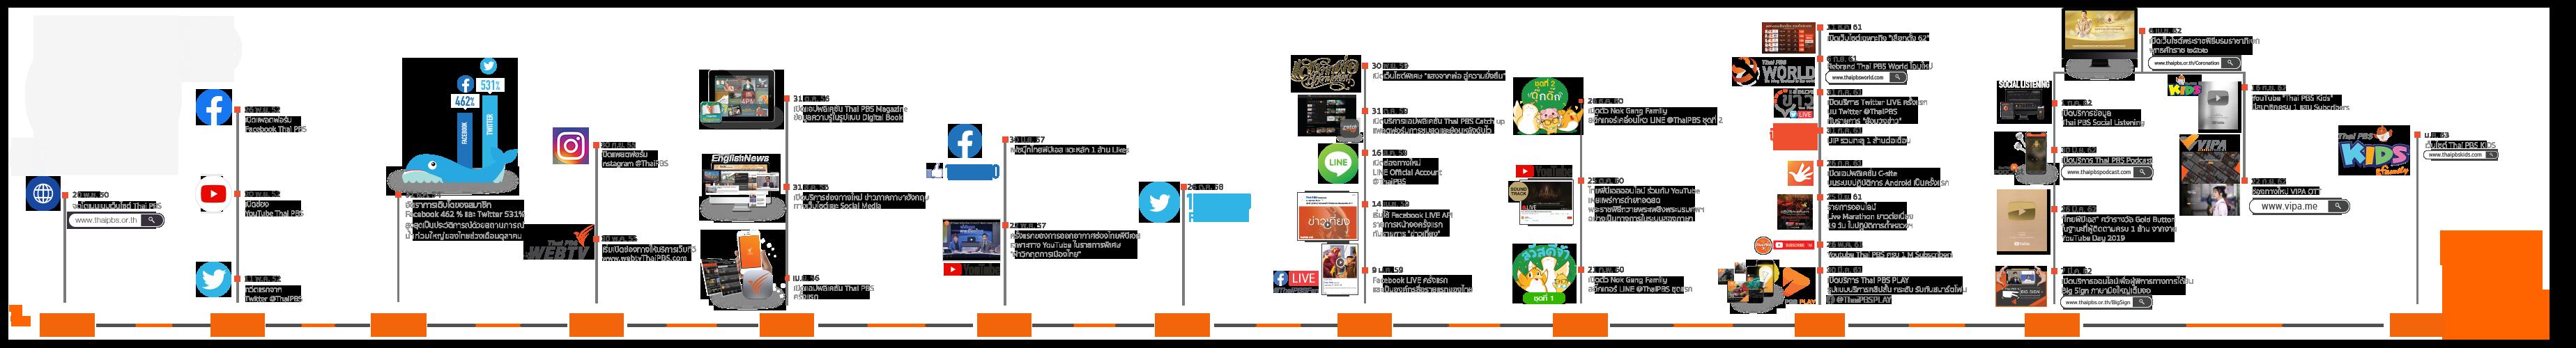 New Media Timeline